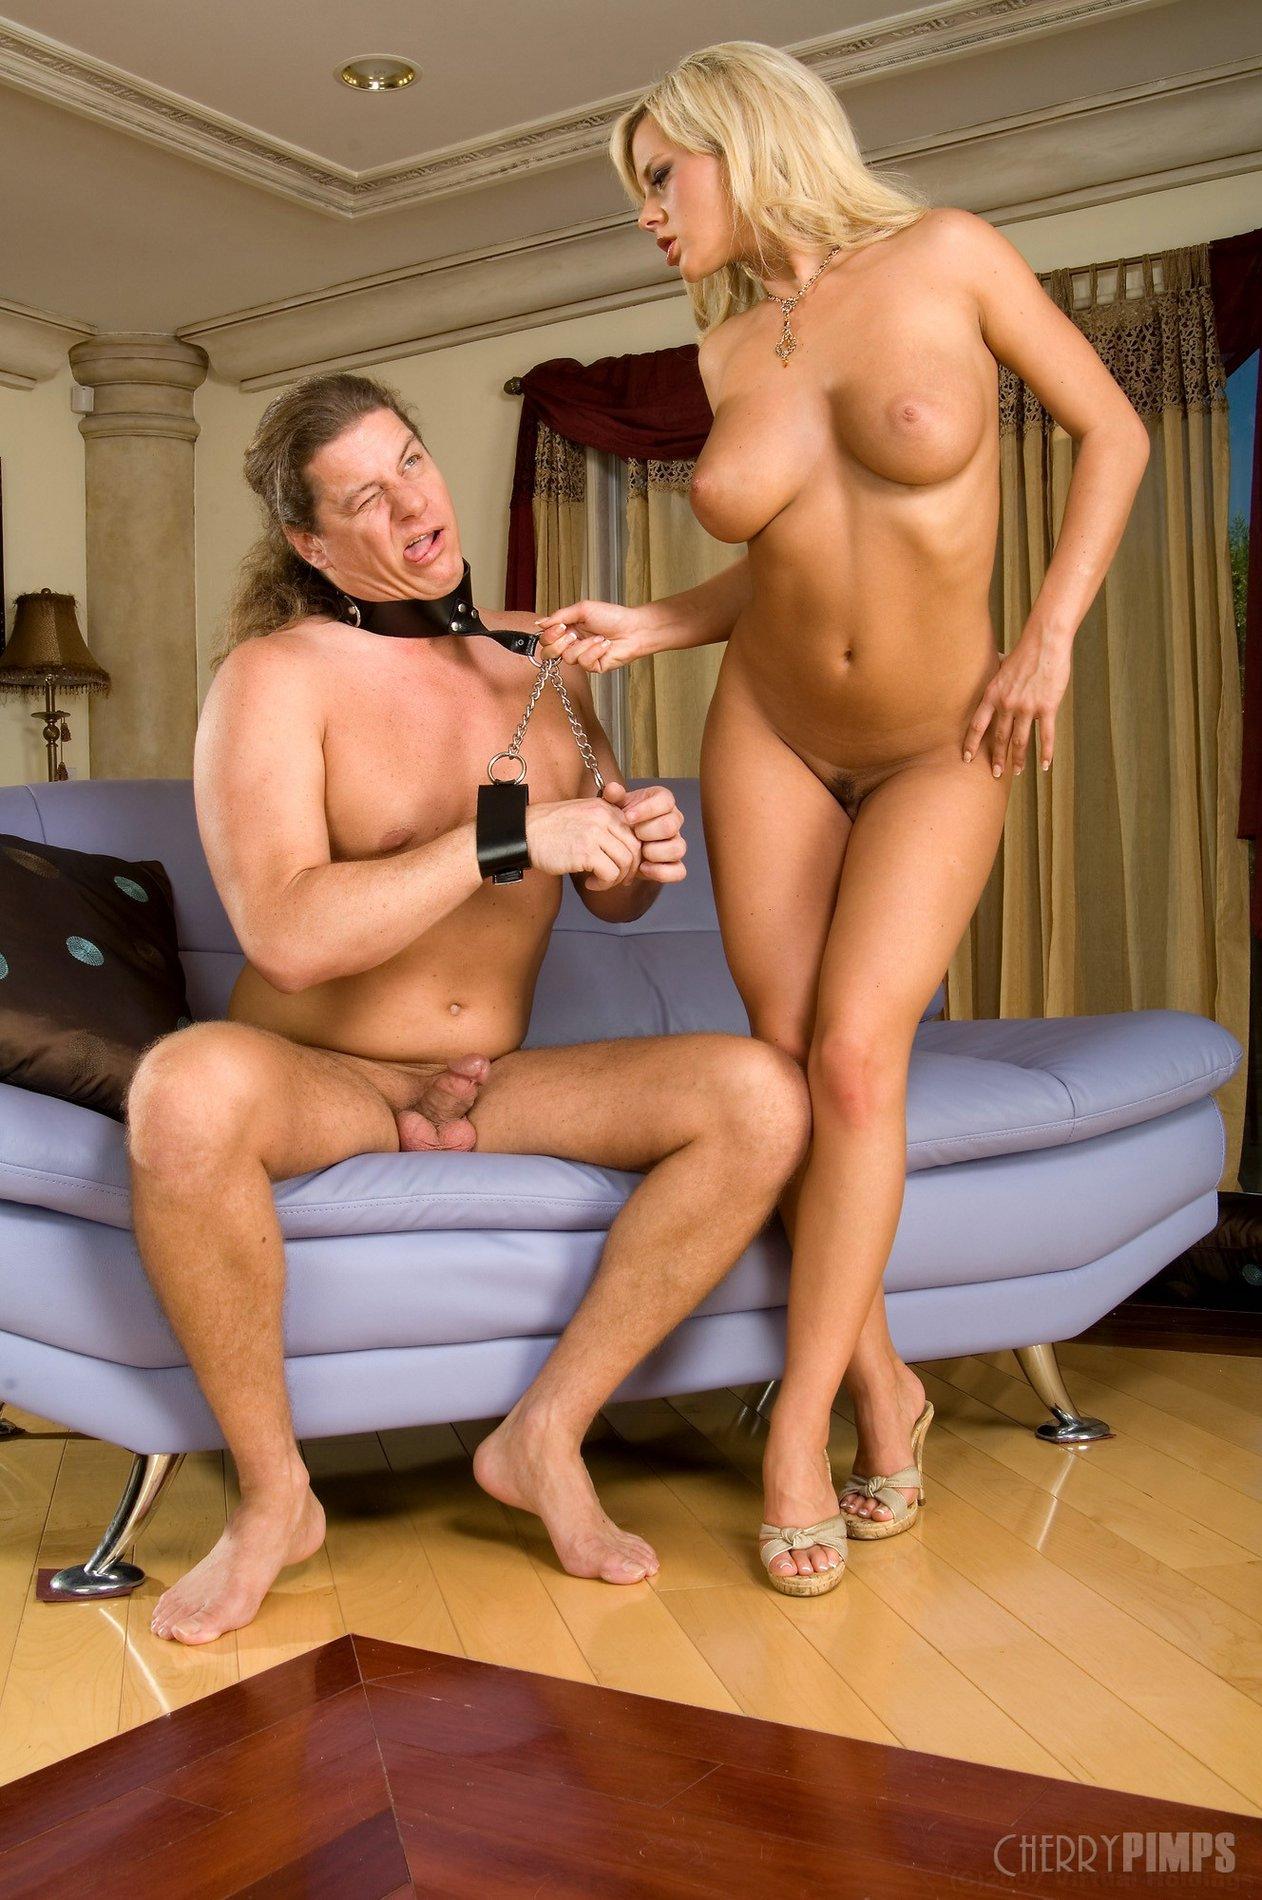 Bree olson nude-8688